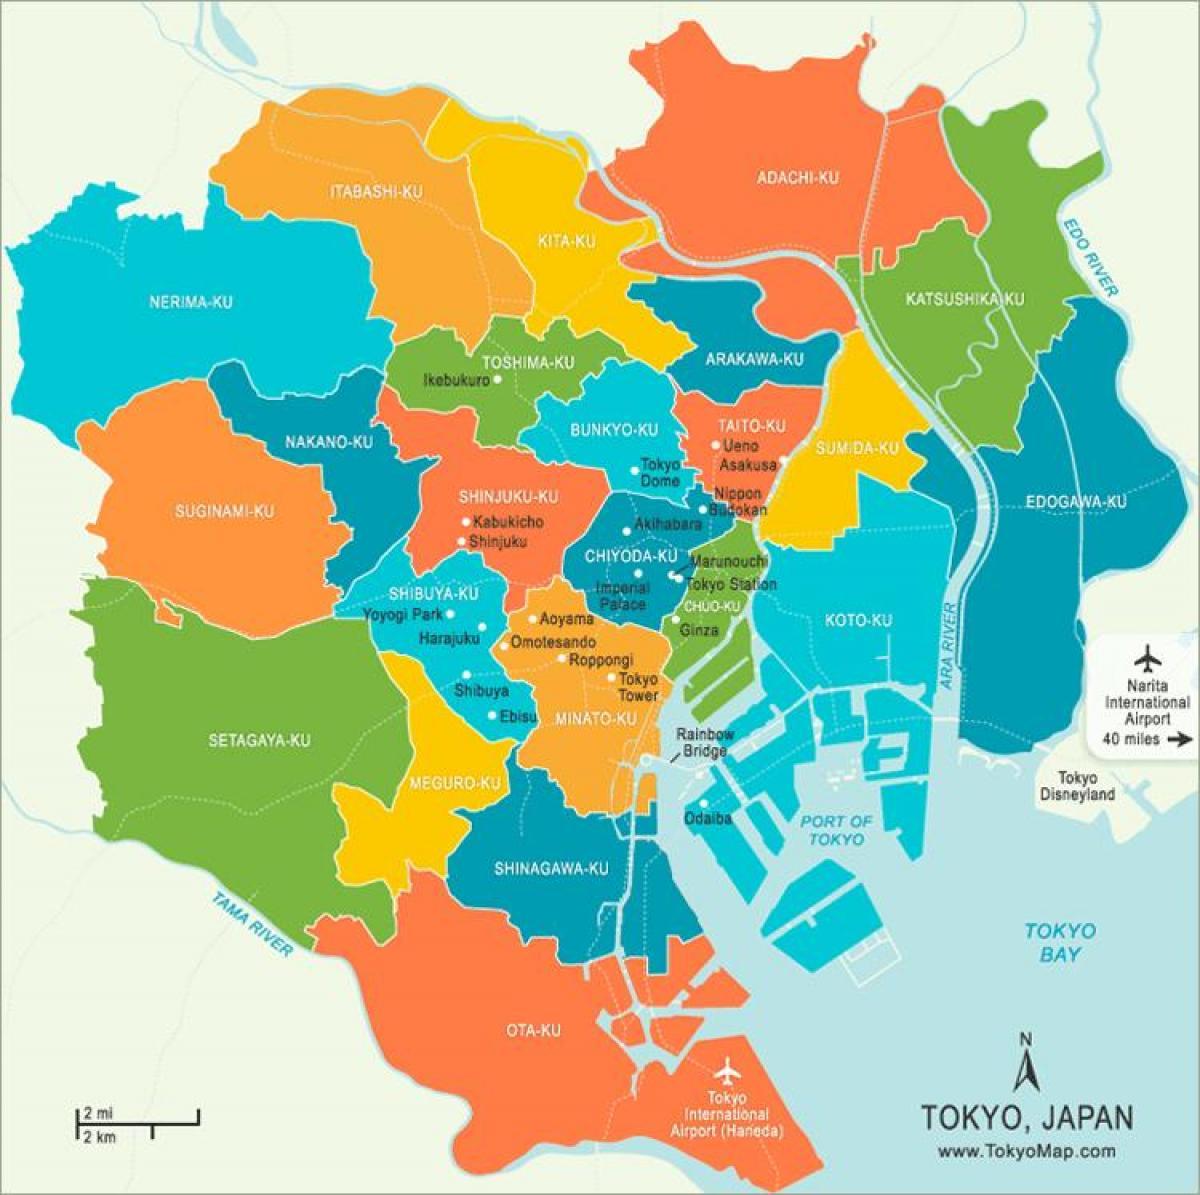 Tokyo Neighborhood Map Map Of Tokyo Neighborhoods Kantō Japan - Japan map tokyo